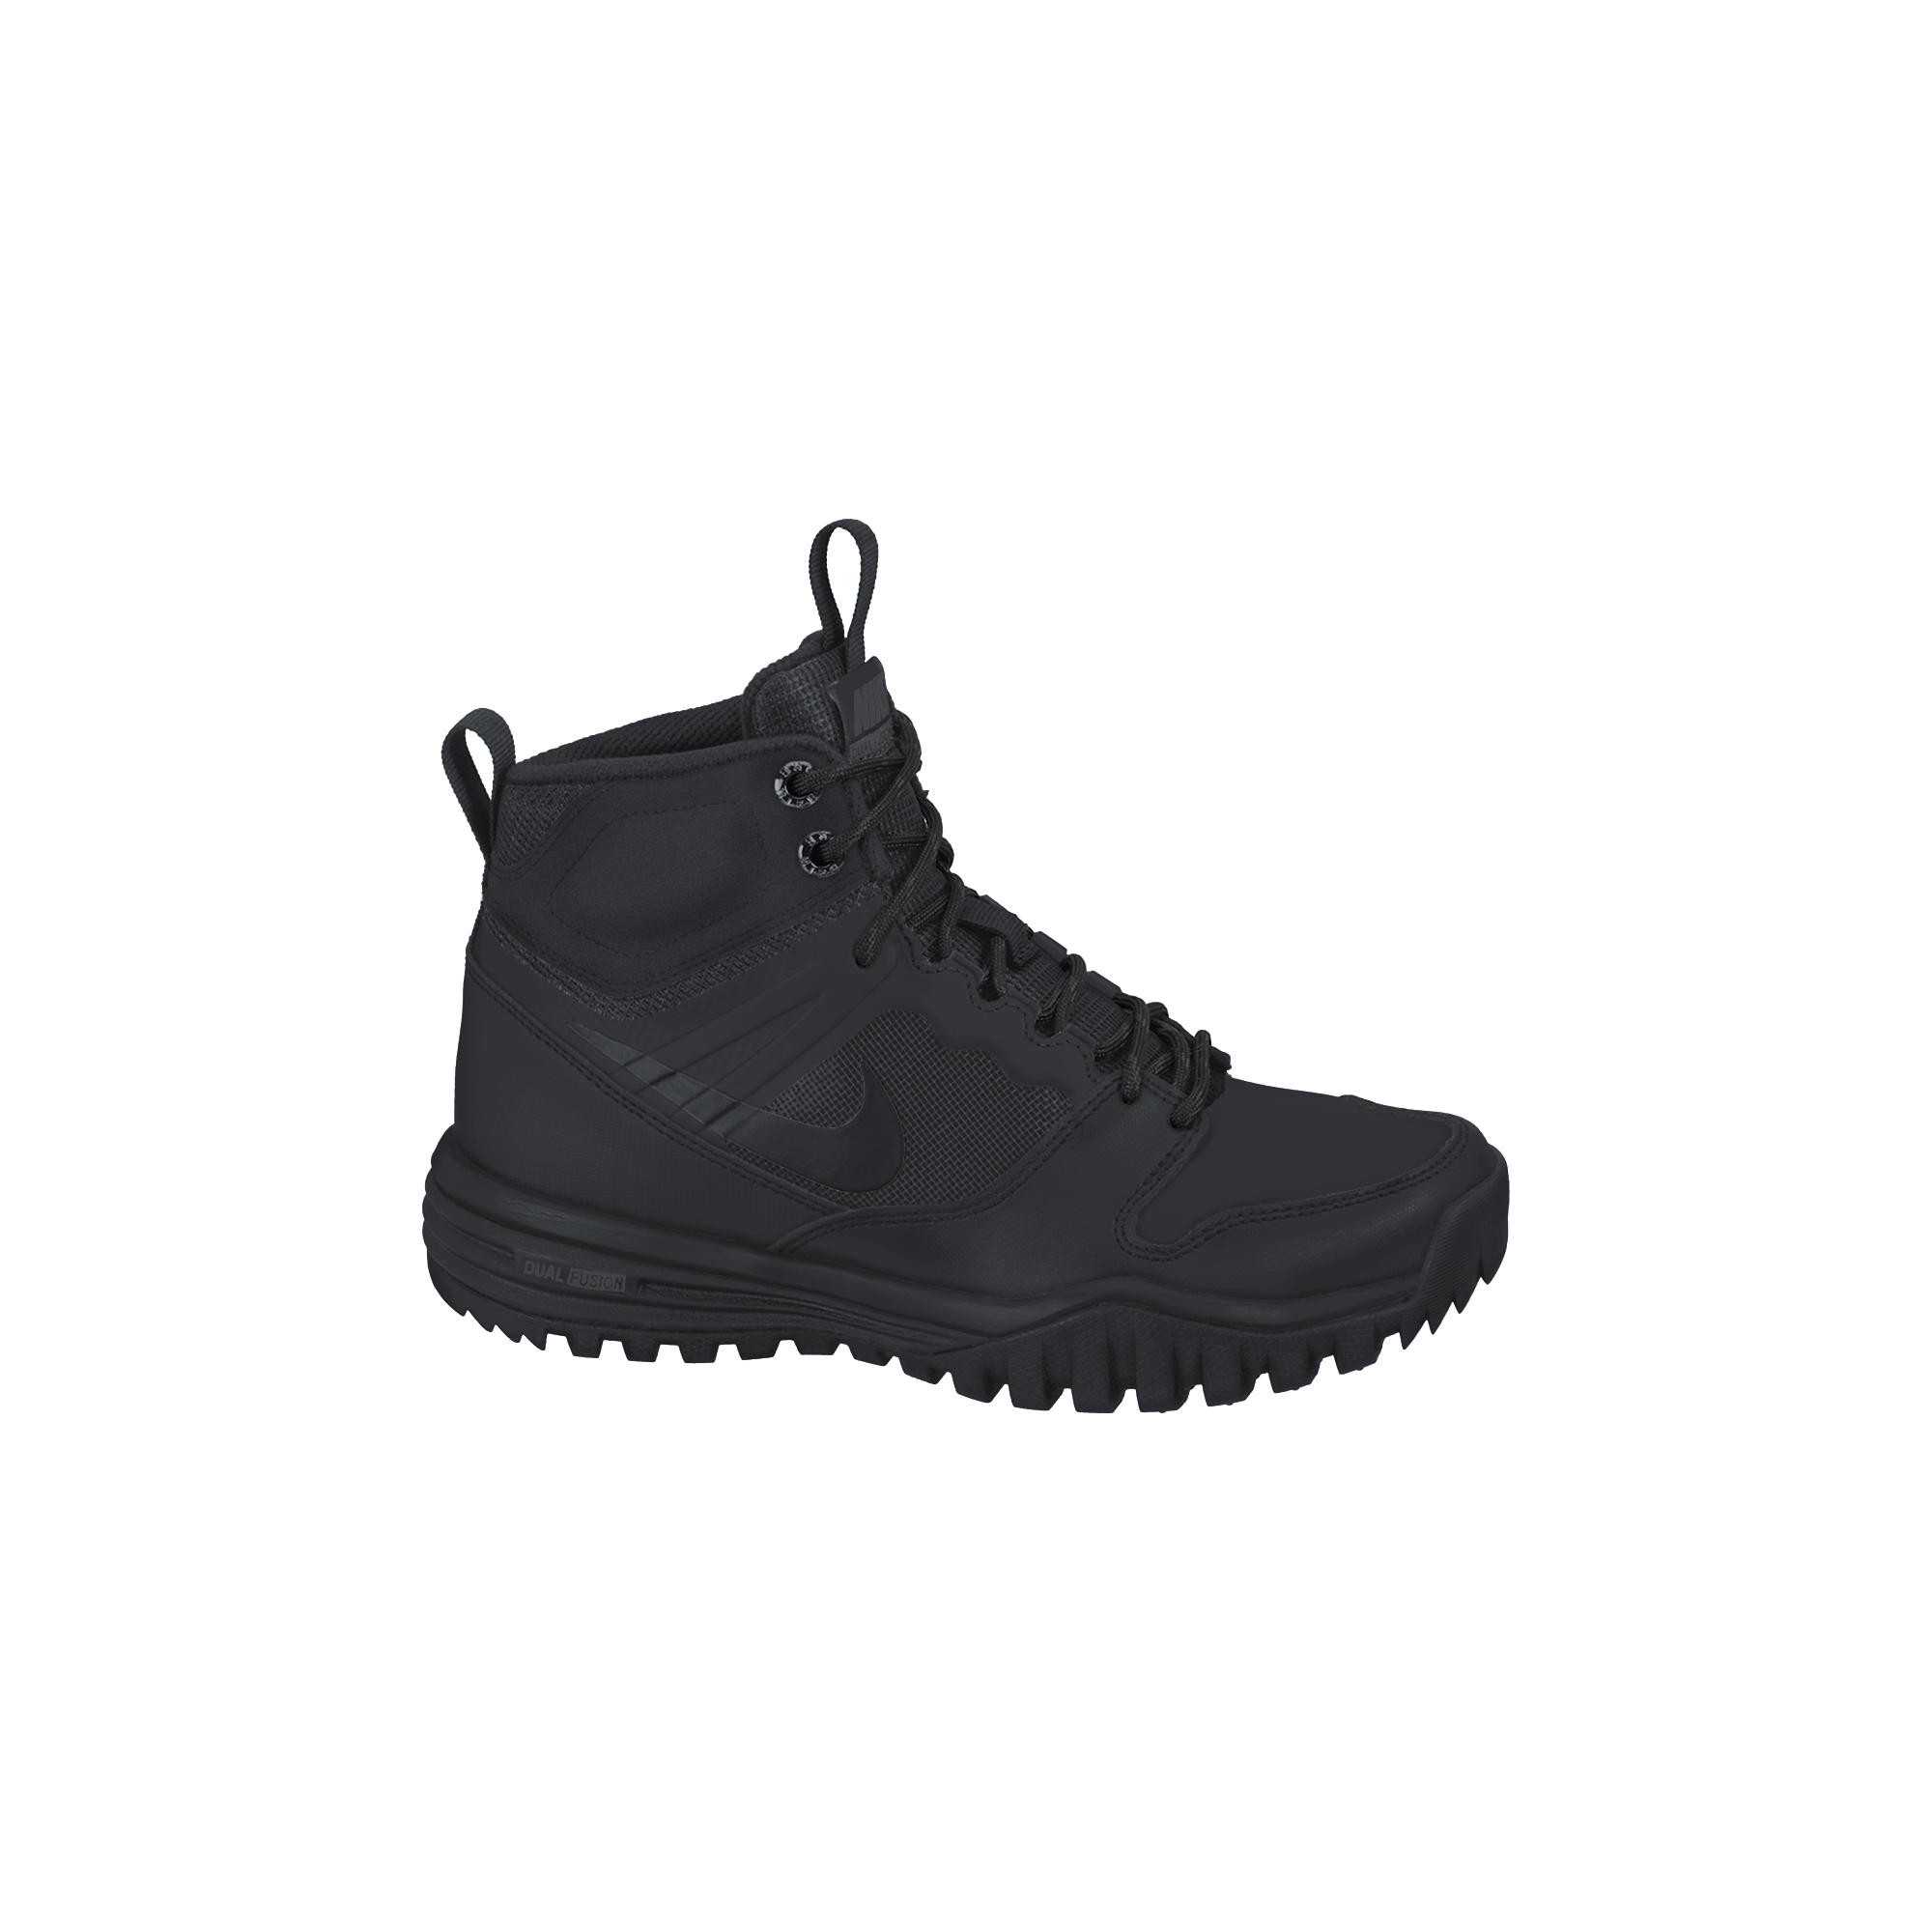 Gyerek Outdoor Mid Nike 685621 Dual Hills Fusion Cipő 020 8vn0OmwN